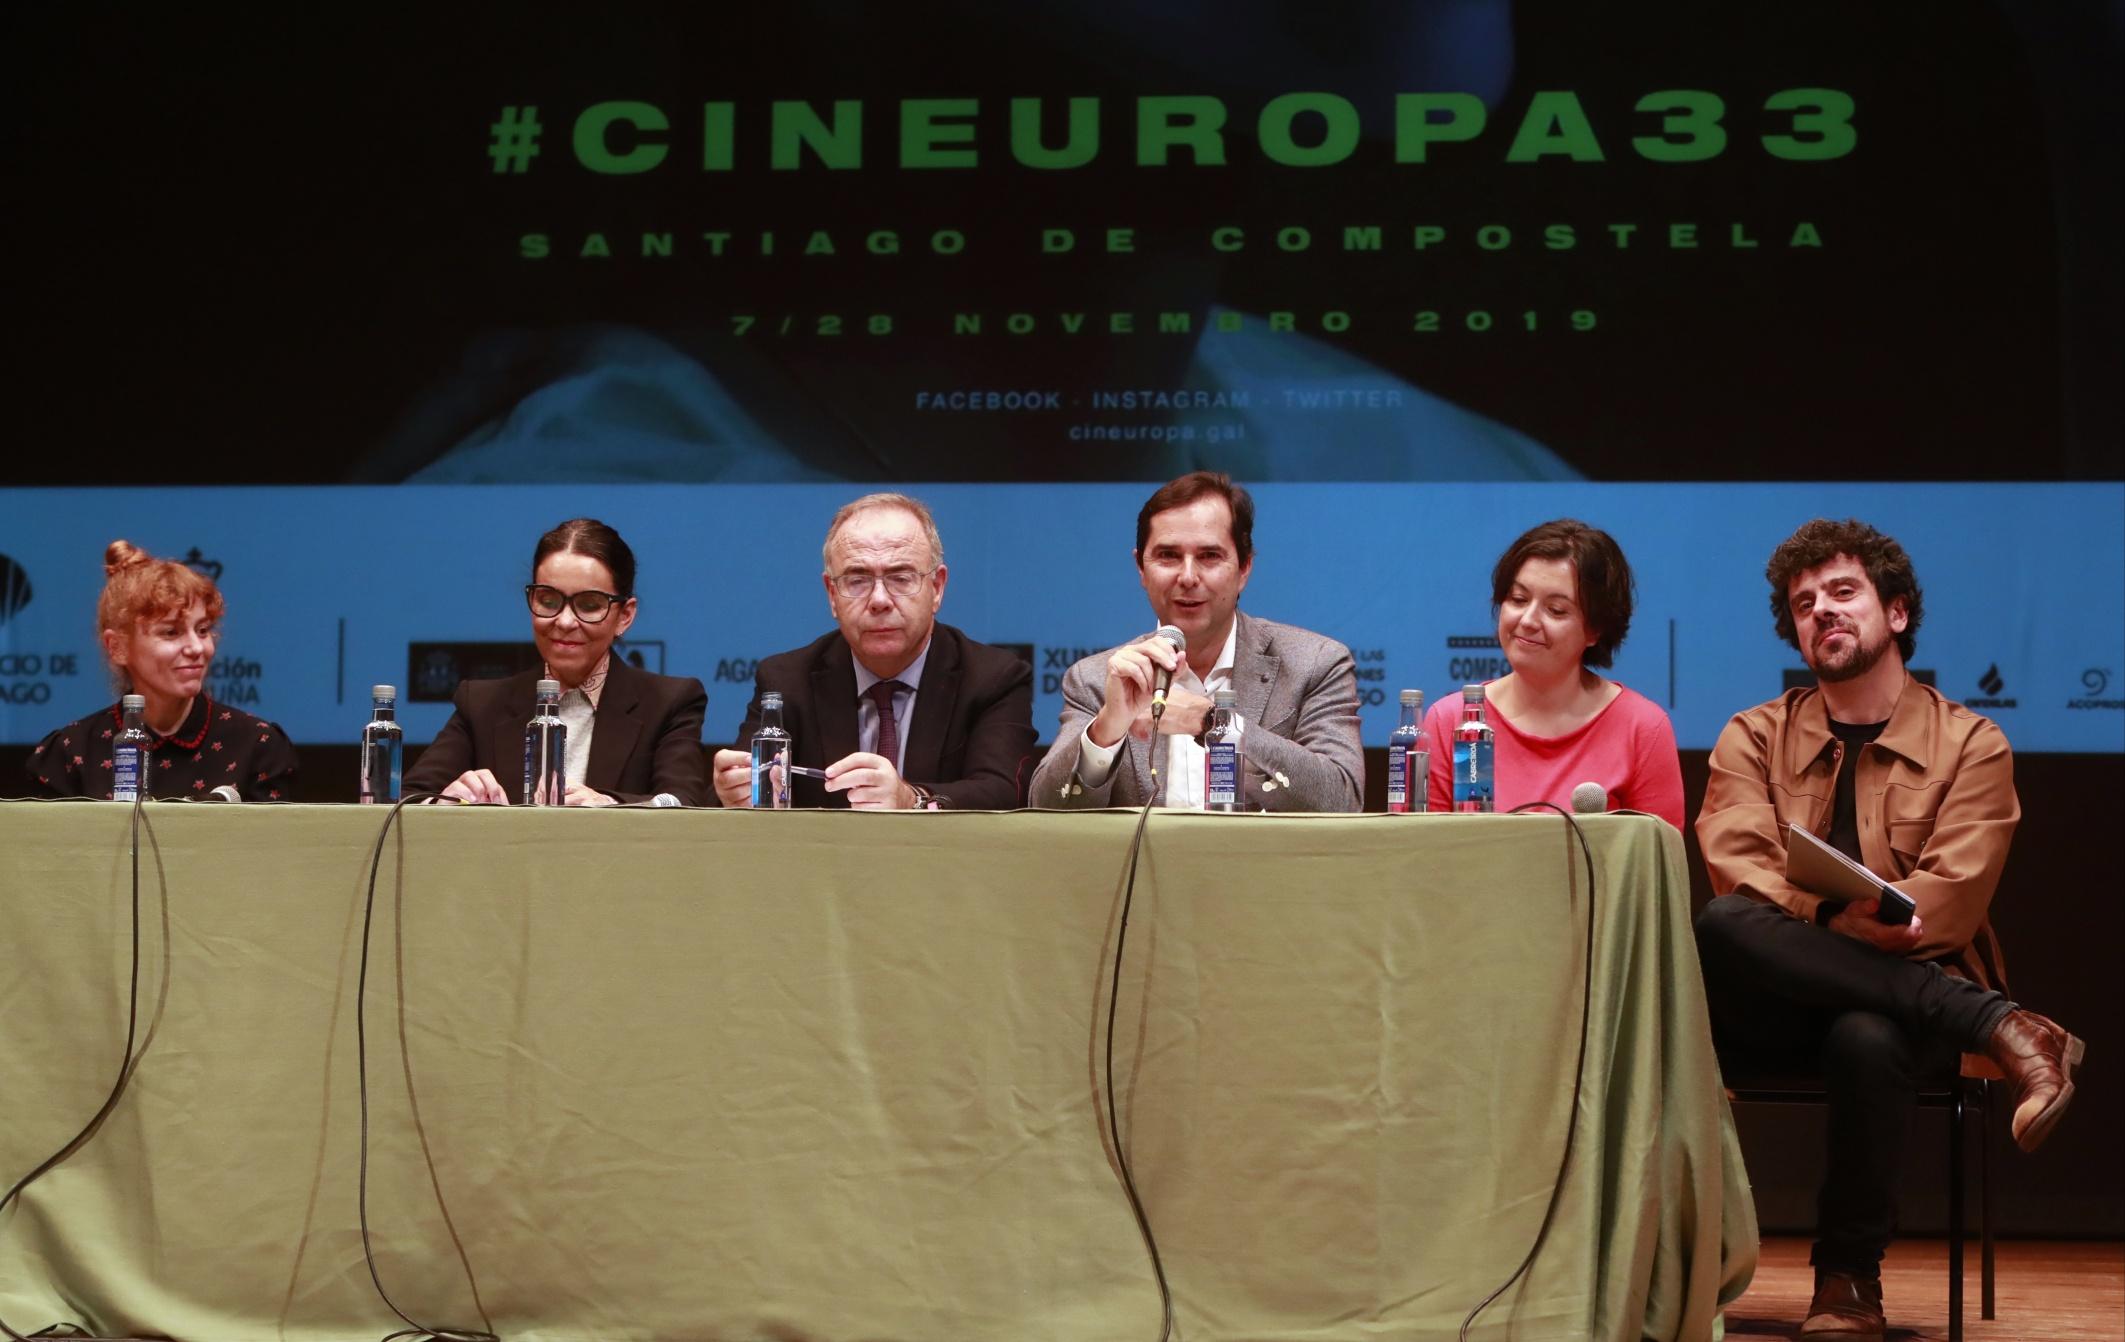 Un momento de la presentación de Cineuropa